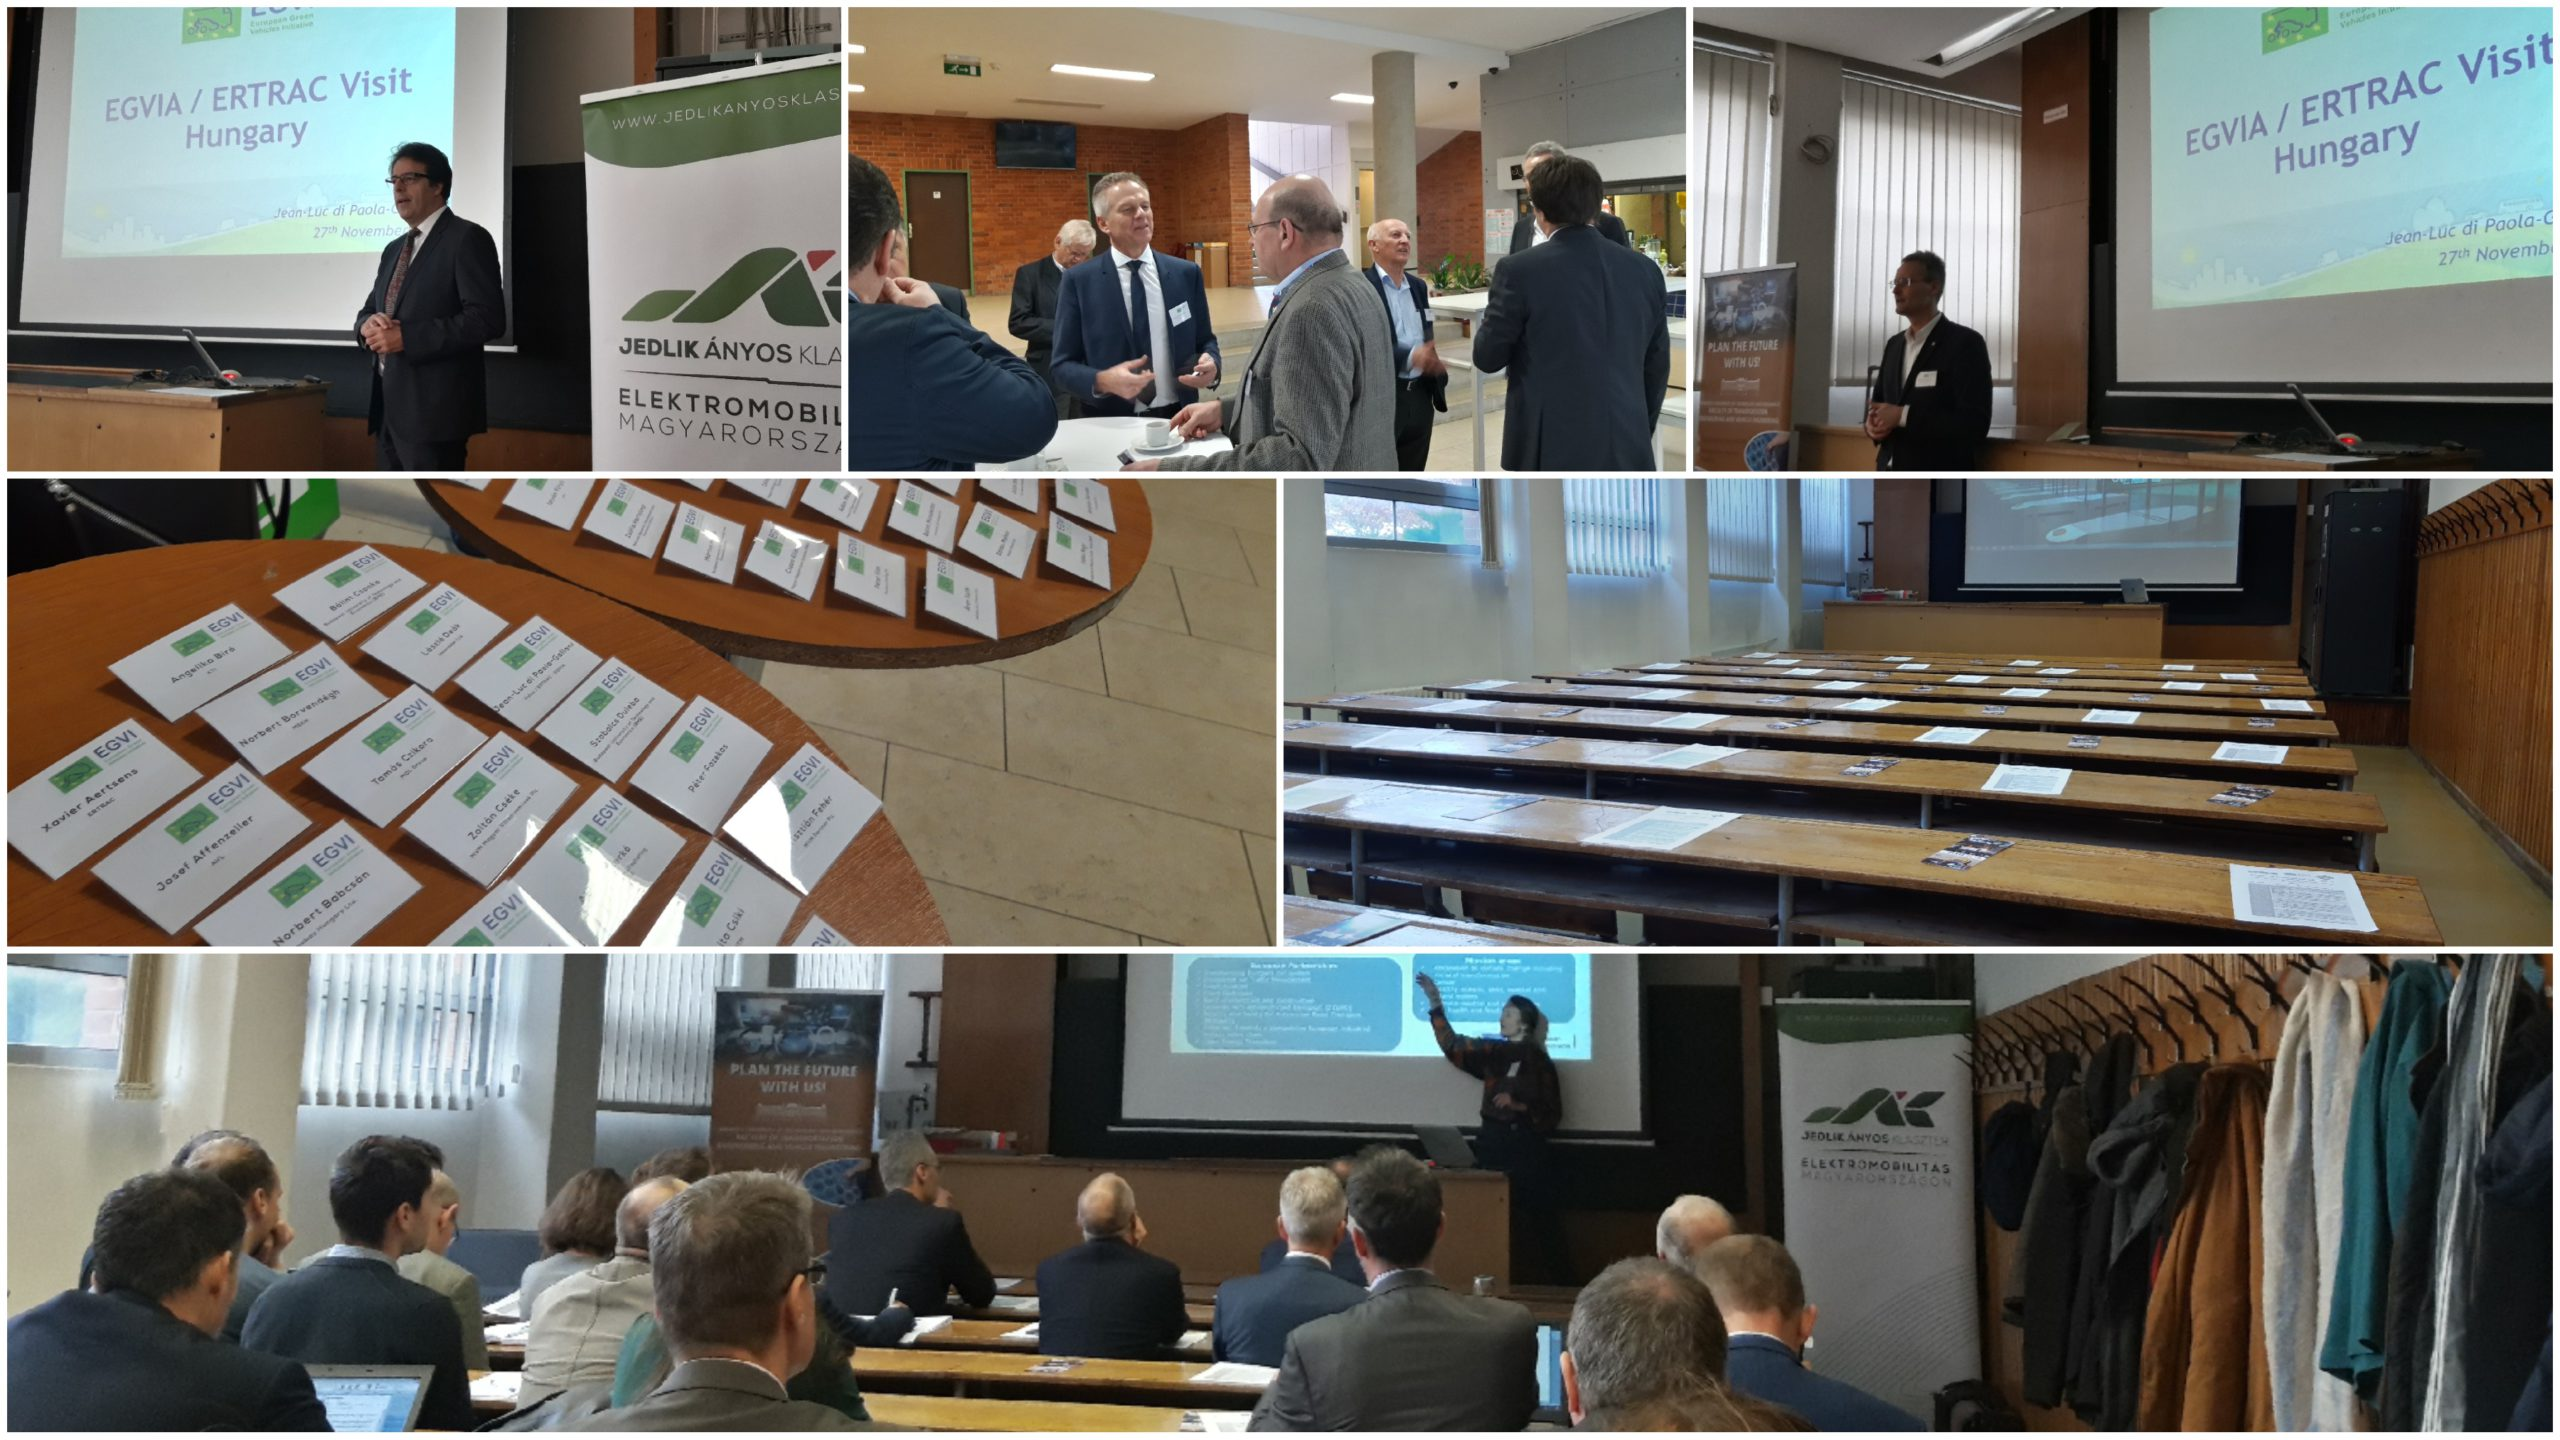 EGVIA Board Visit to Hungarian Stakeholders last November 2019